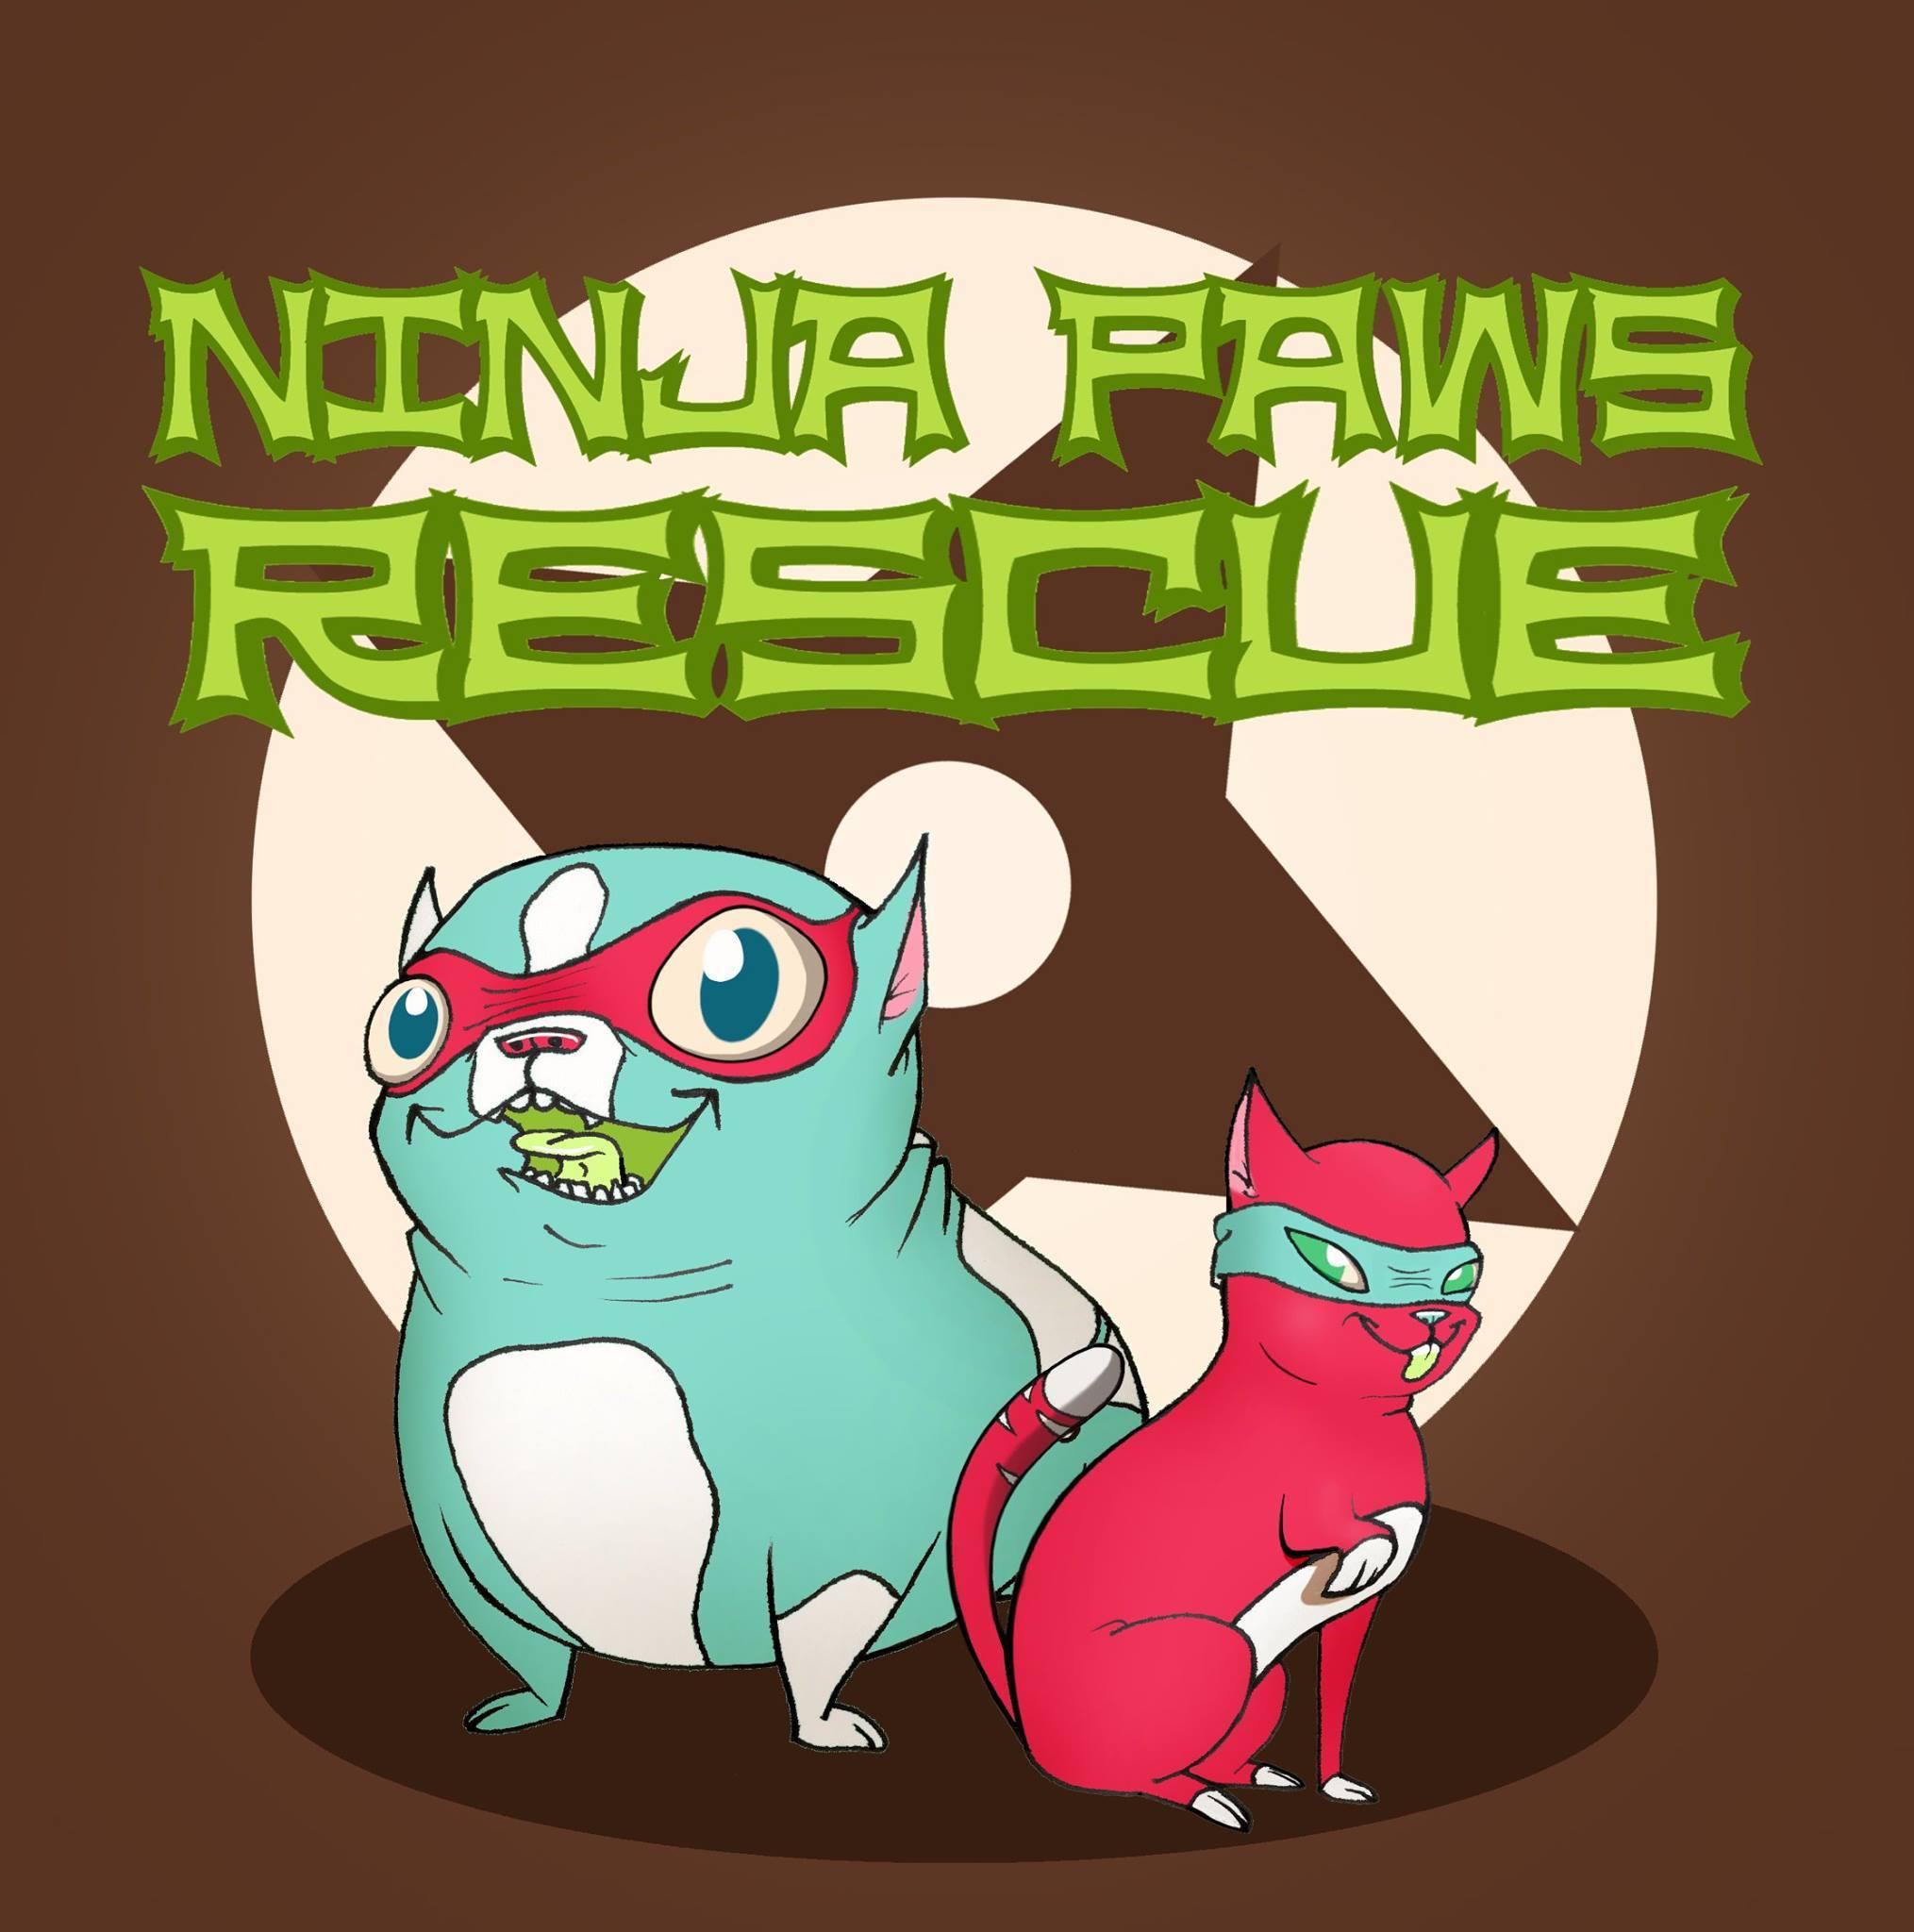 Ninja Paws Rescue